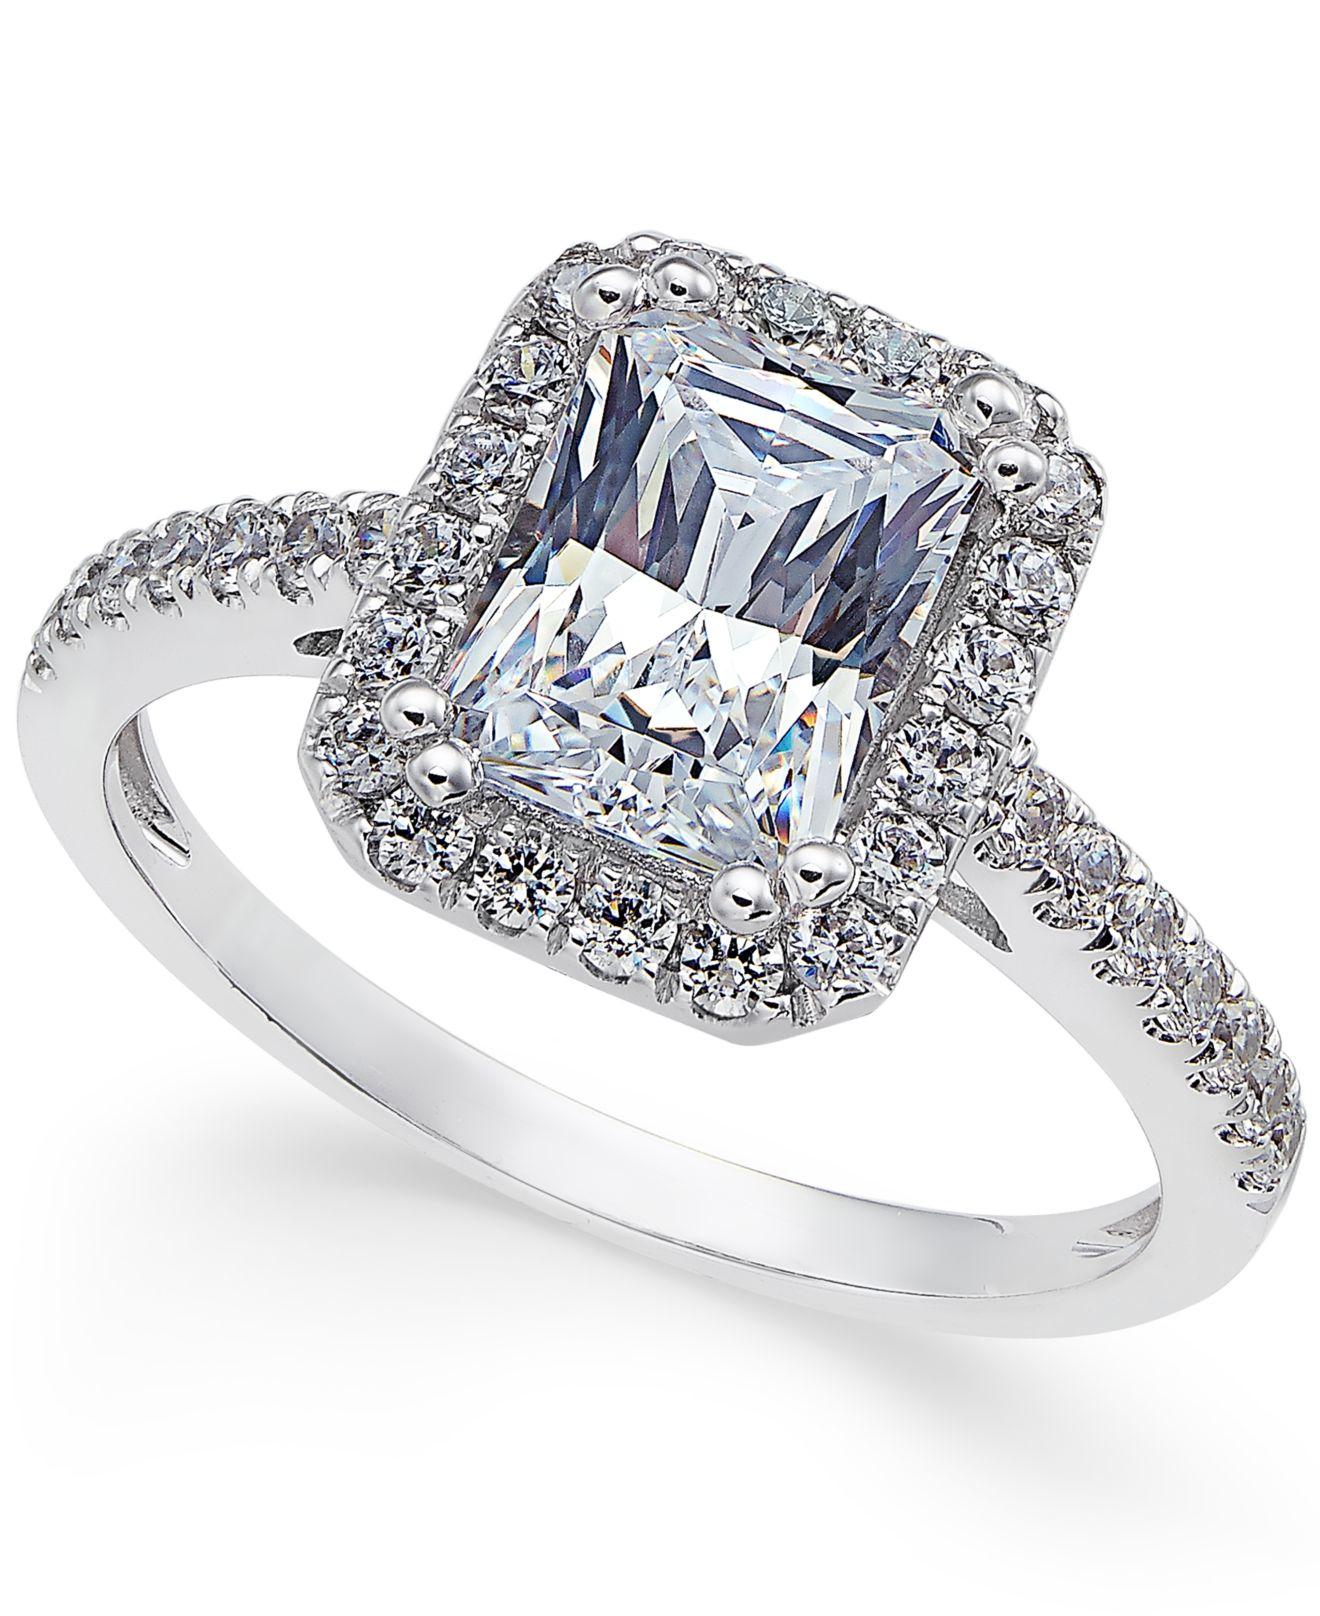 Effy Diamond Engagement Rings